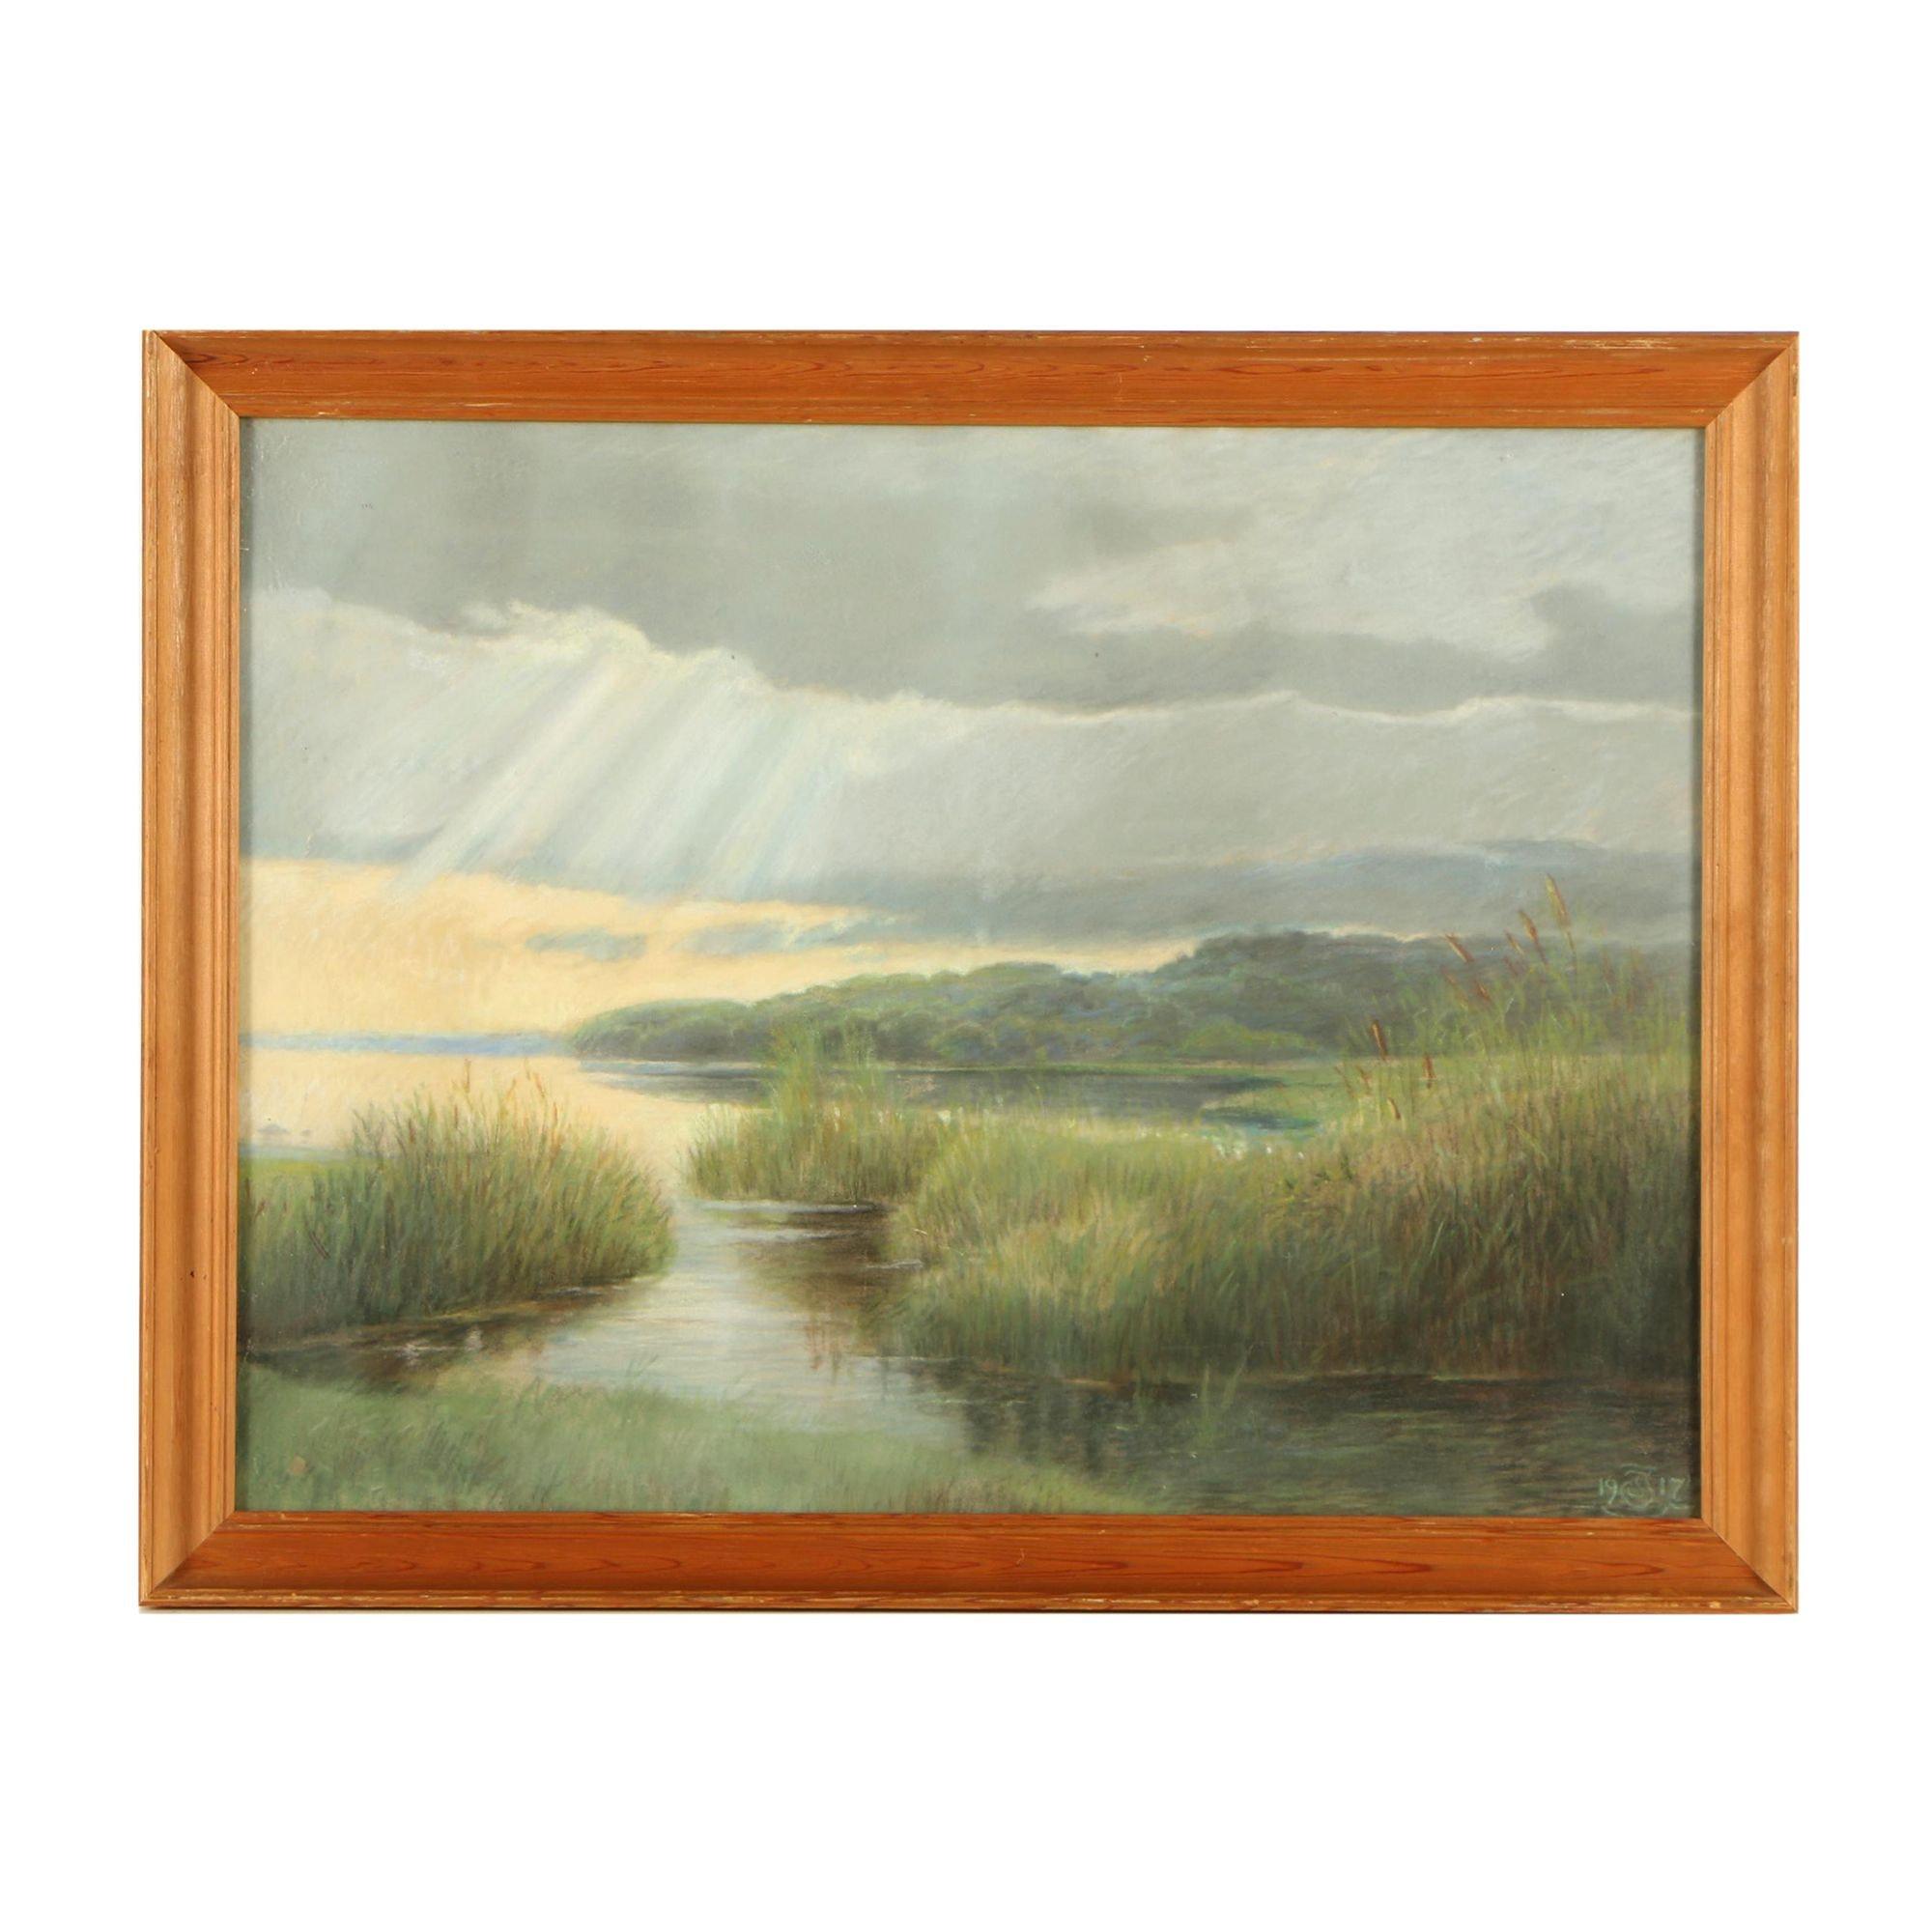 Pastel Drawing of a Lake